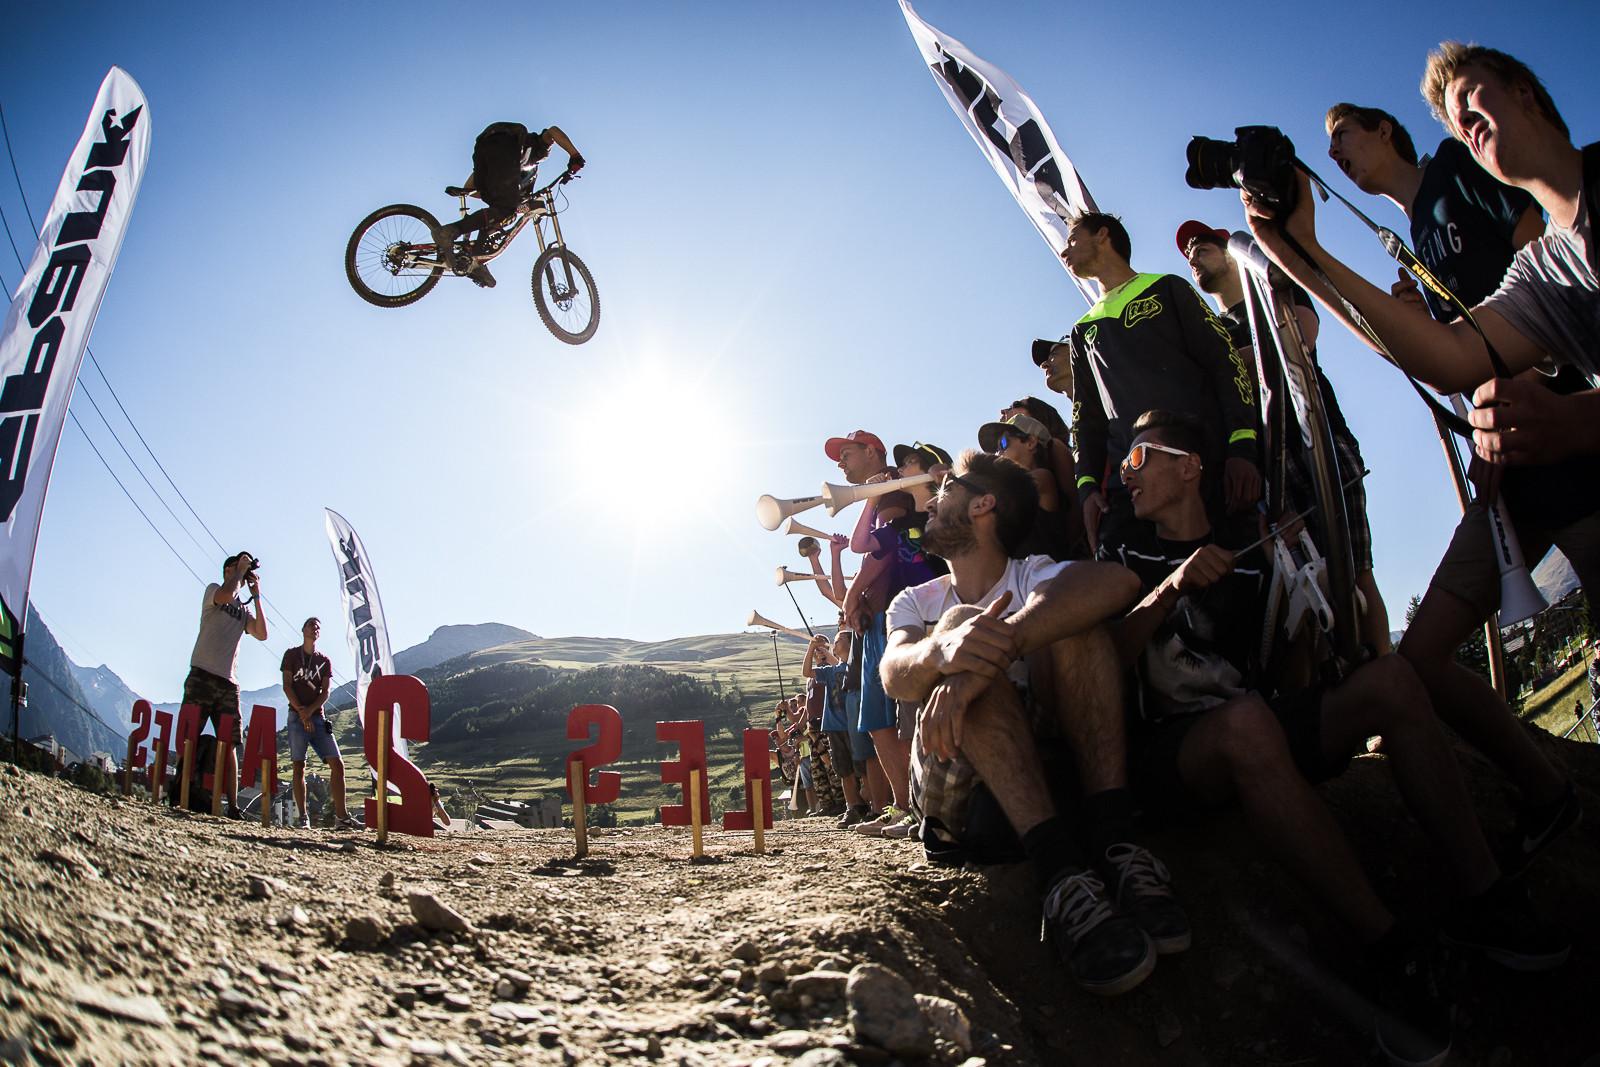 Big Bike Blasting, Whip Off European Champs, Crankworx L2A - Whip Off European Champs, Crankworx L2A - Mountain Biking Pictures - Vital MTB